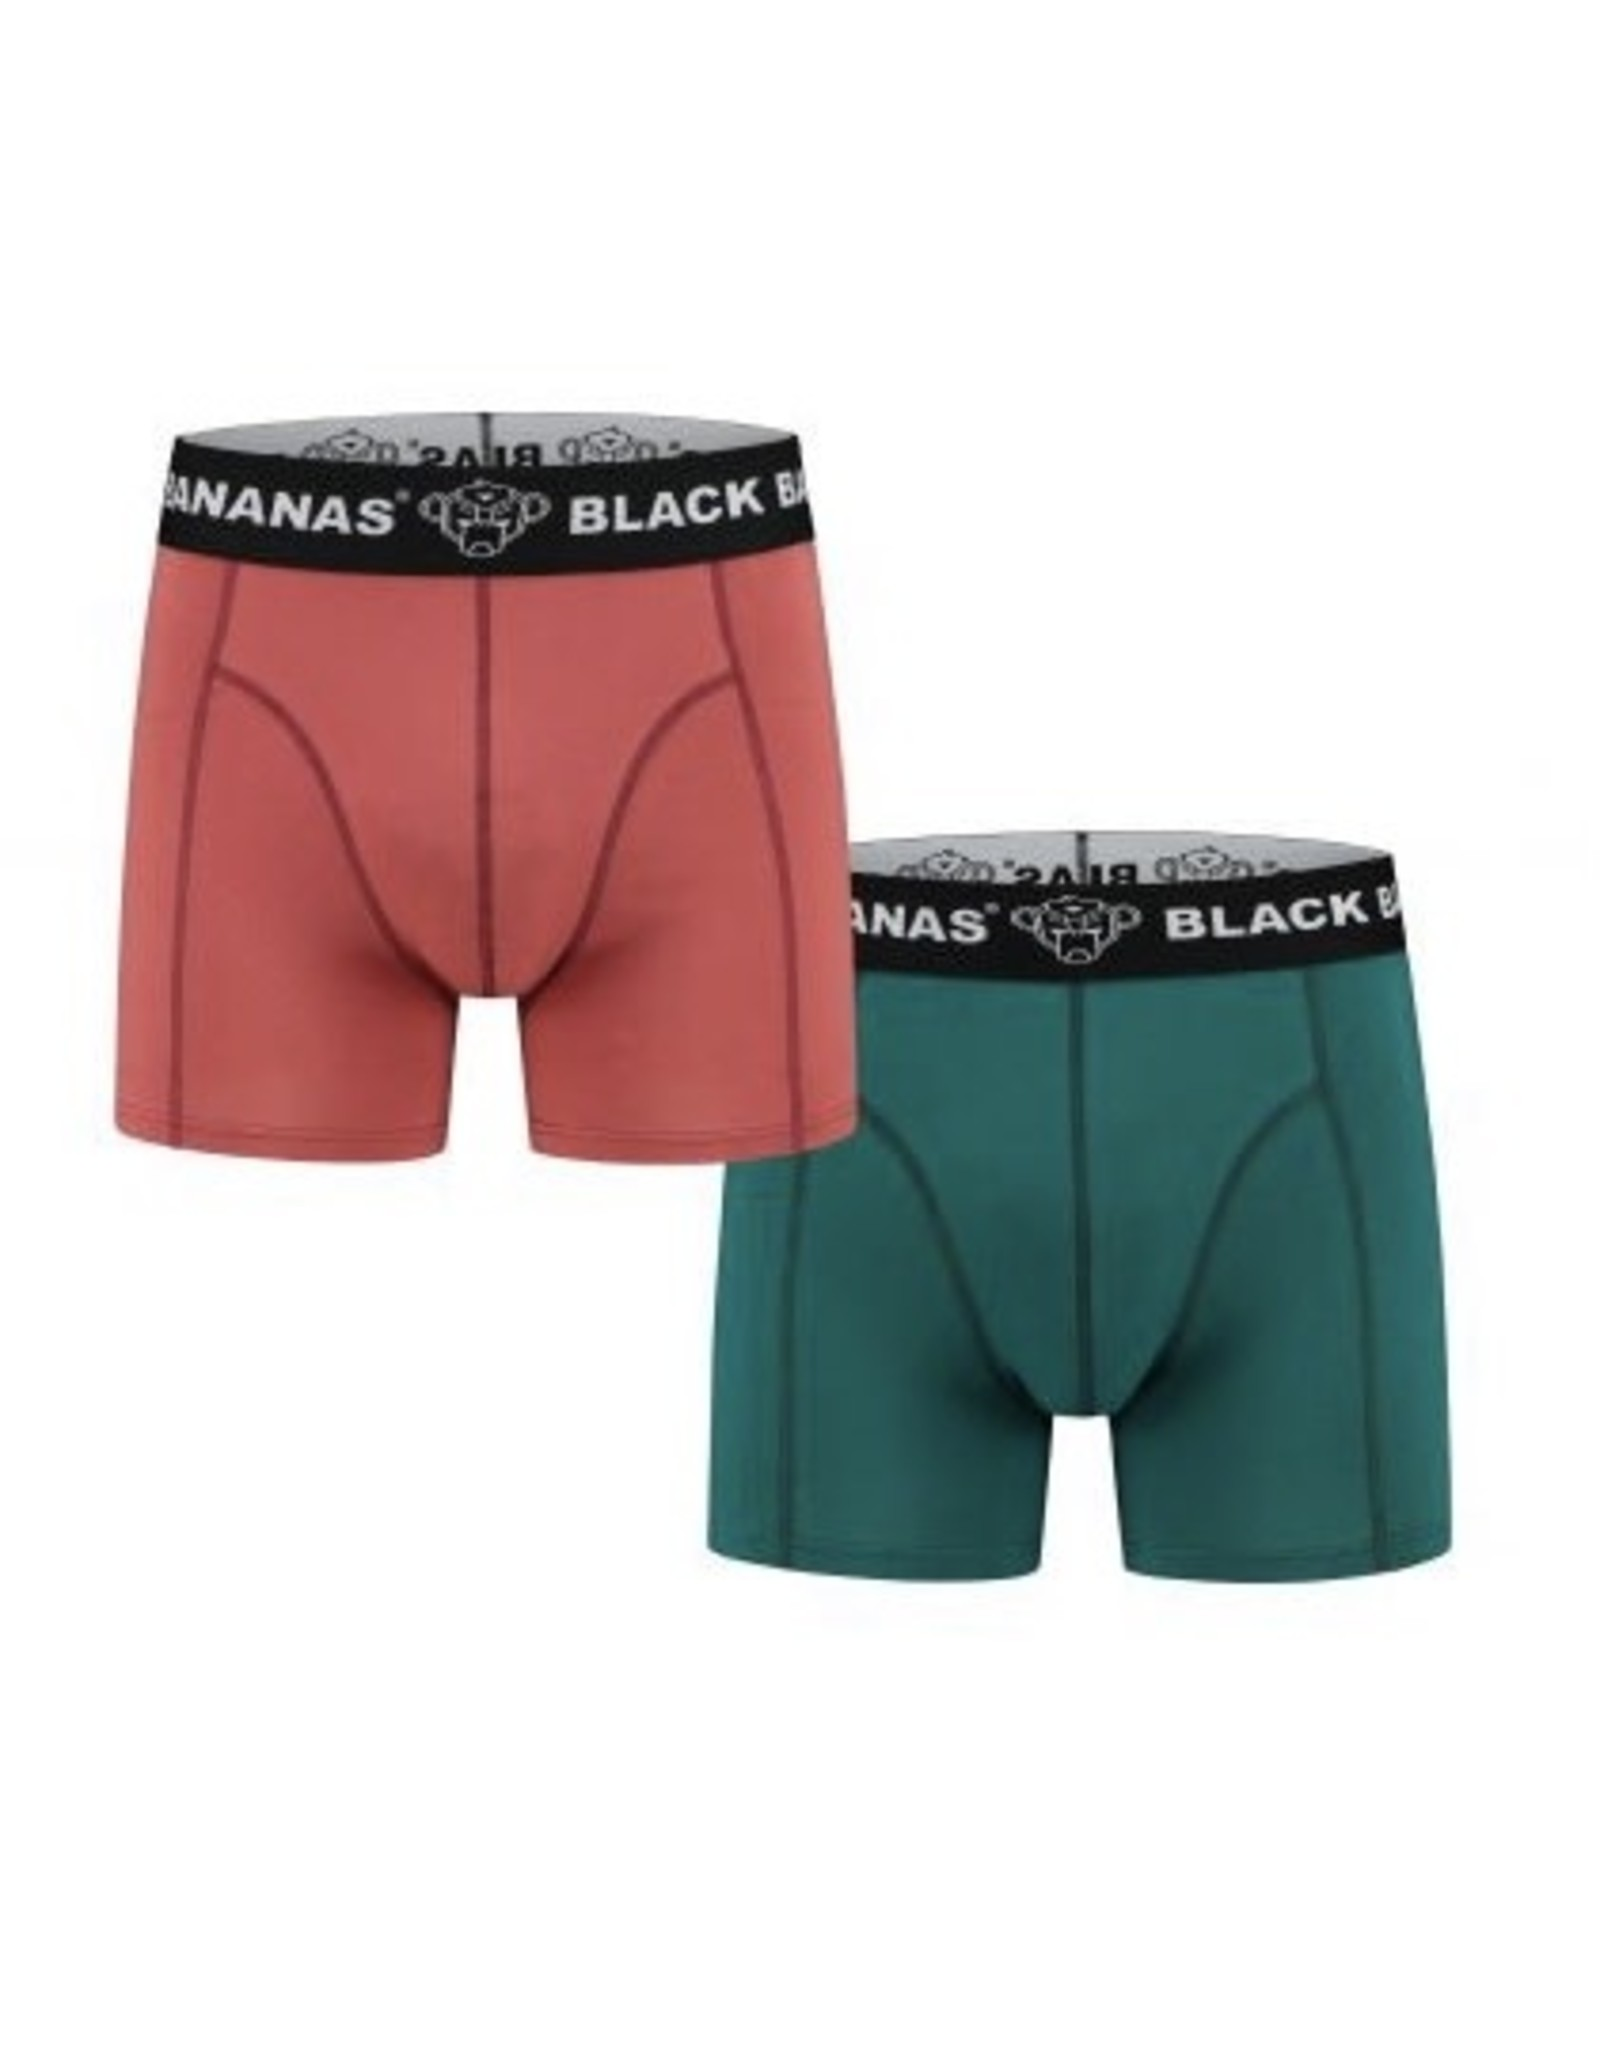 Black Bananas Noos.jr003 boxershort 2 Pack